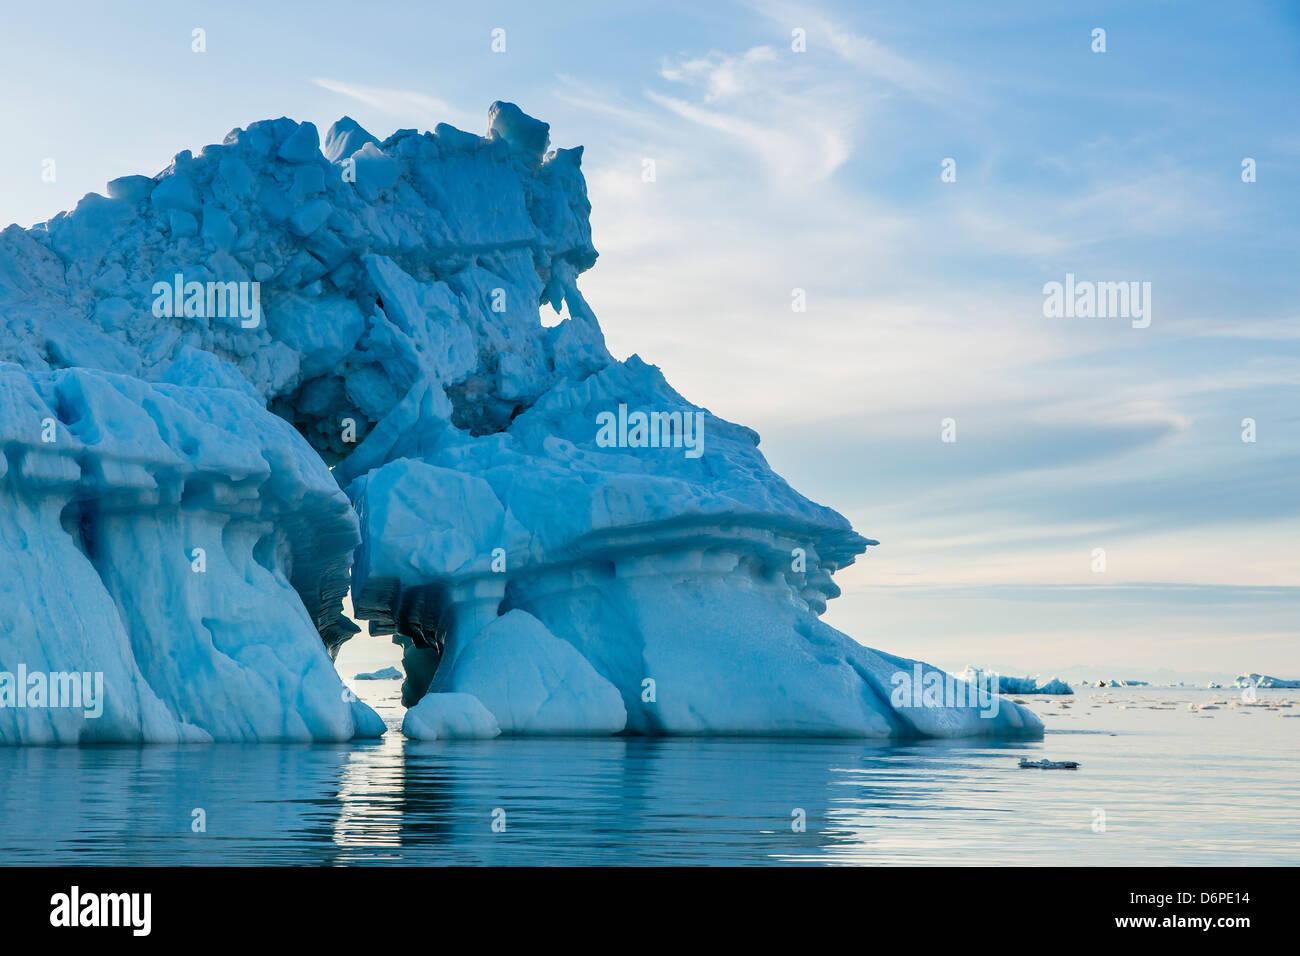 Iceberg, Vikingbukta (Bahía), Viking Scoresbysund, al noreste de Groenlandia, las regiones polares Foto de stock